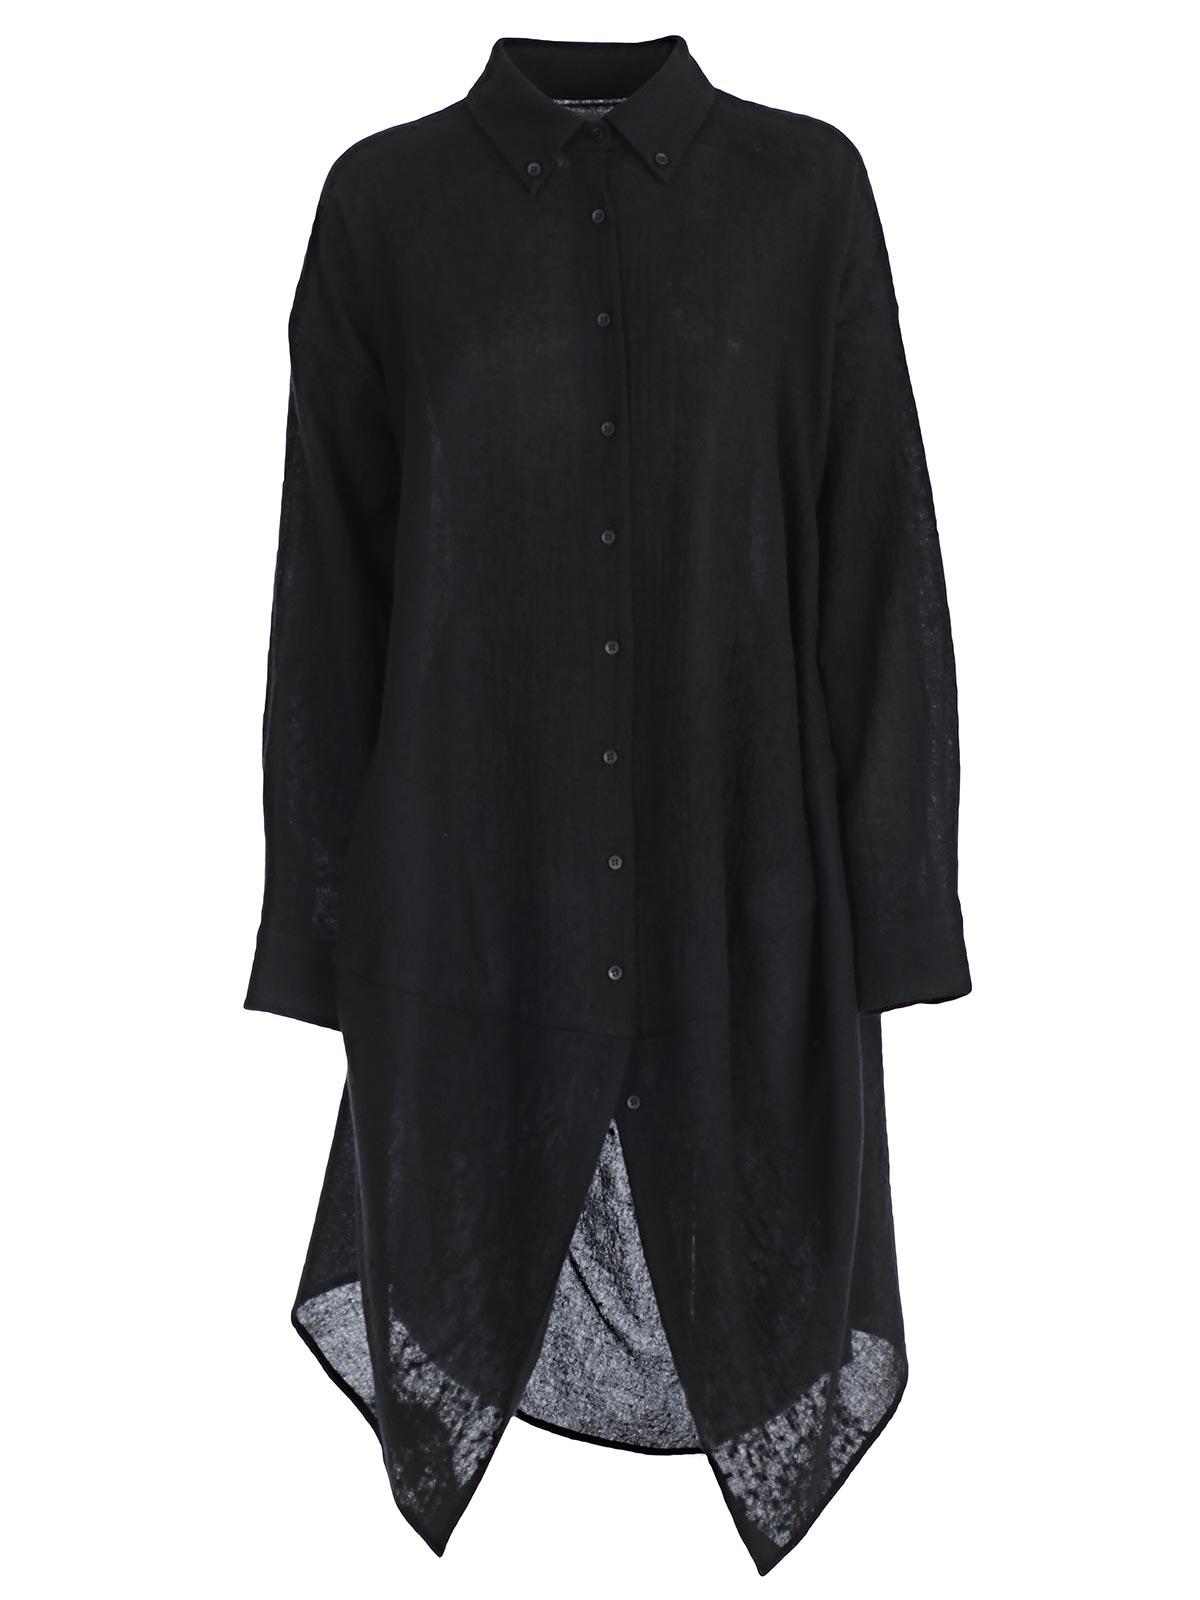 Picture of Uma Wang Shirts